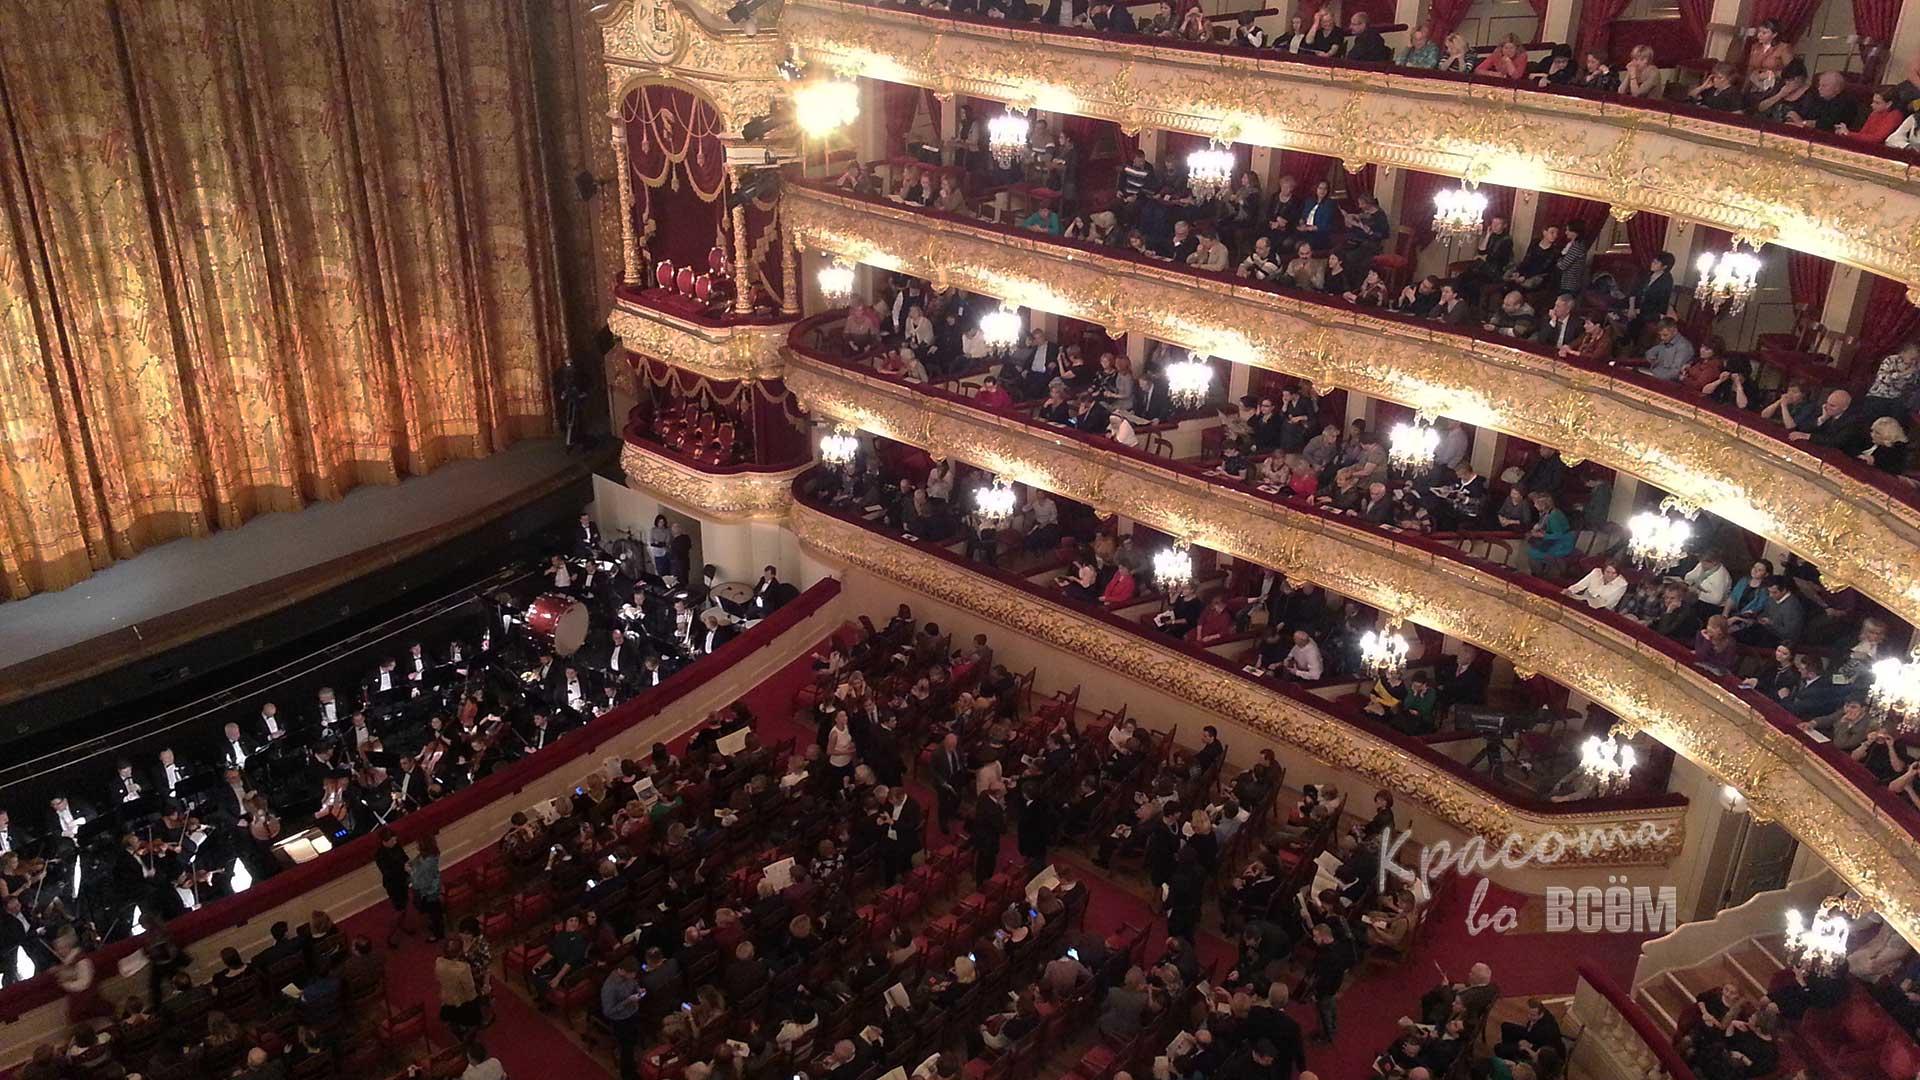 Театр, партер, балкон, музыканты, этикет концерт красота во всем http://krasotavovsem.ru/